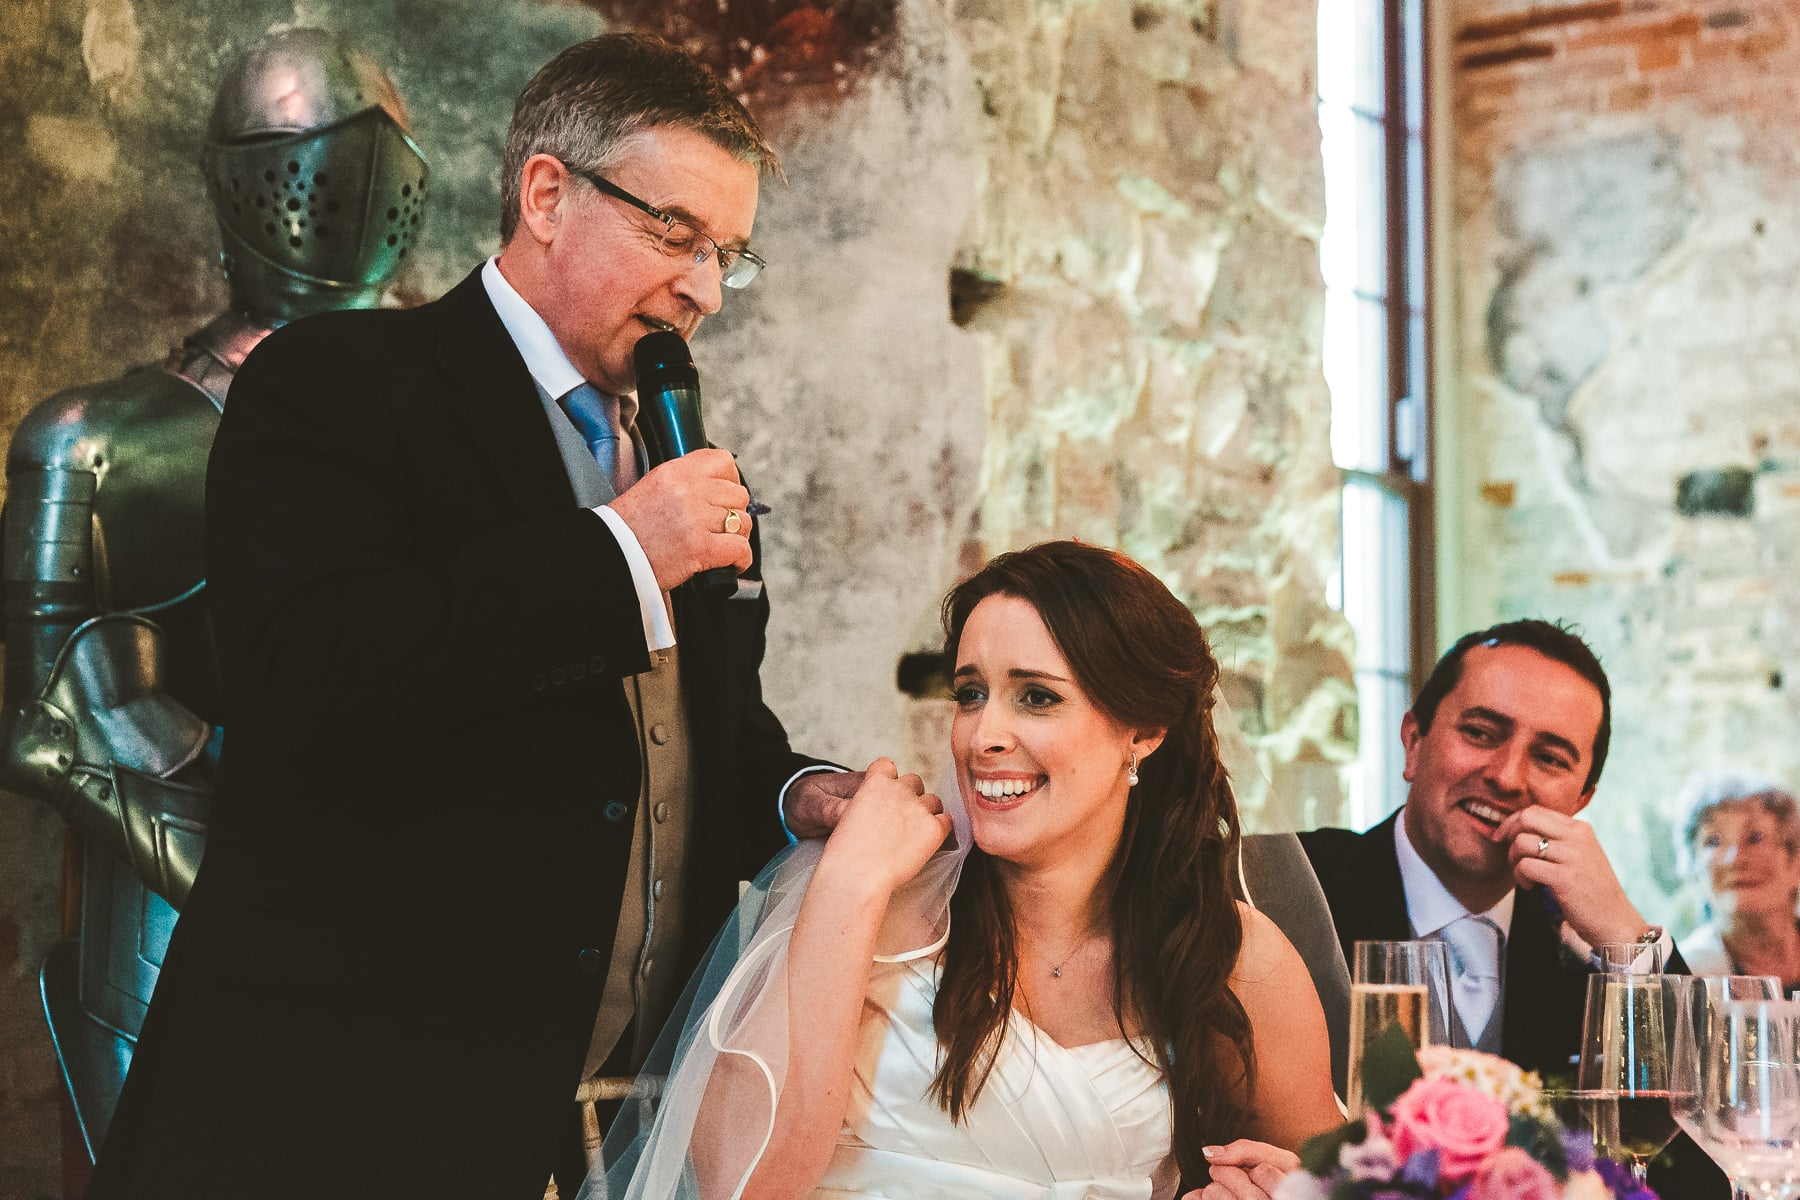 Wedding-speech-Lulworth-Castle-wedding-photography